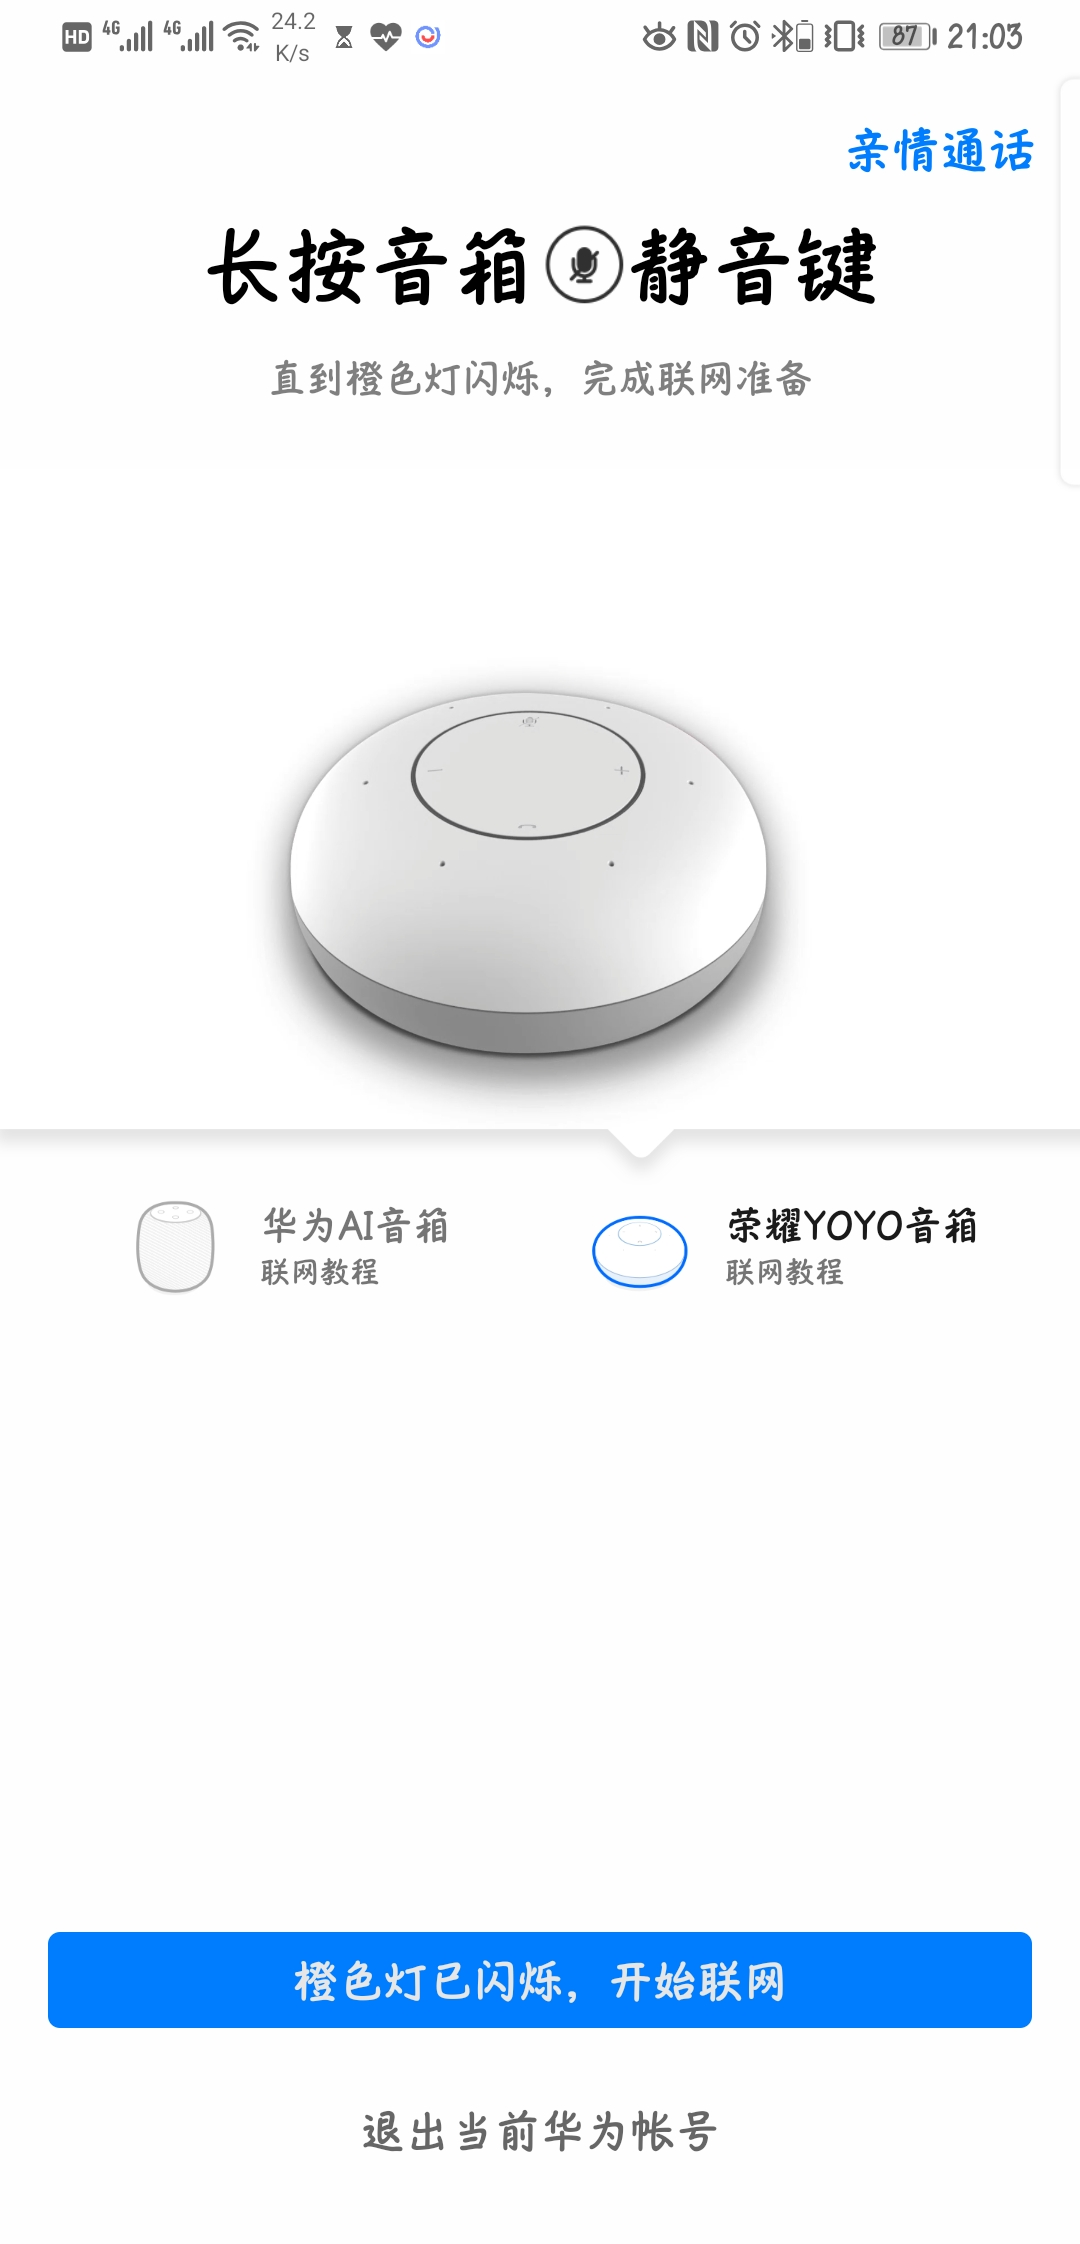 Screenshot_20190121_210328_com.huawei.smartspeaker.jpg